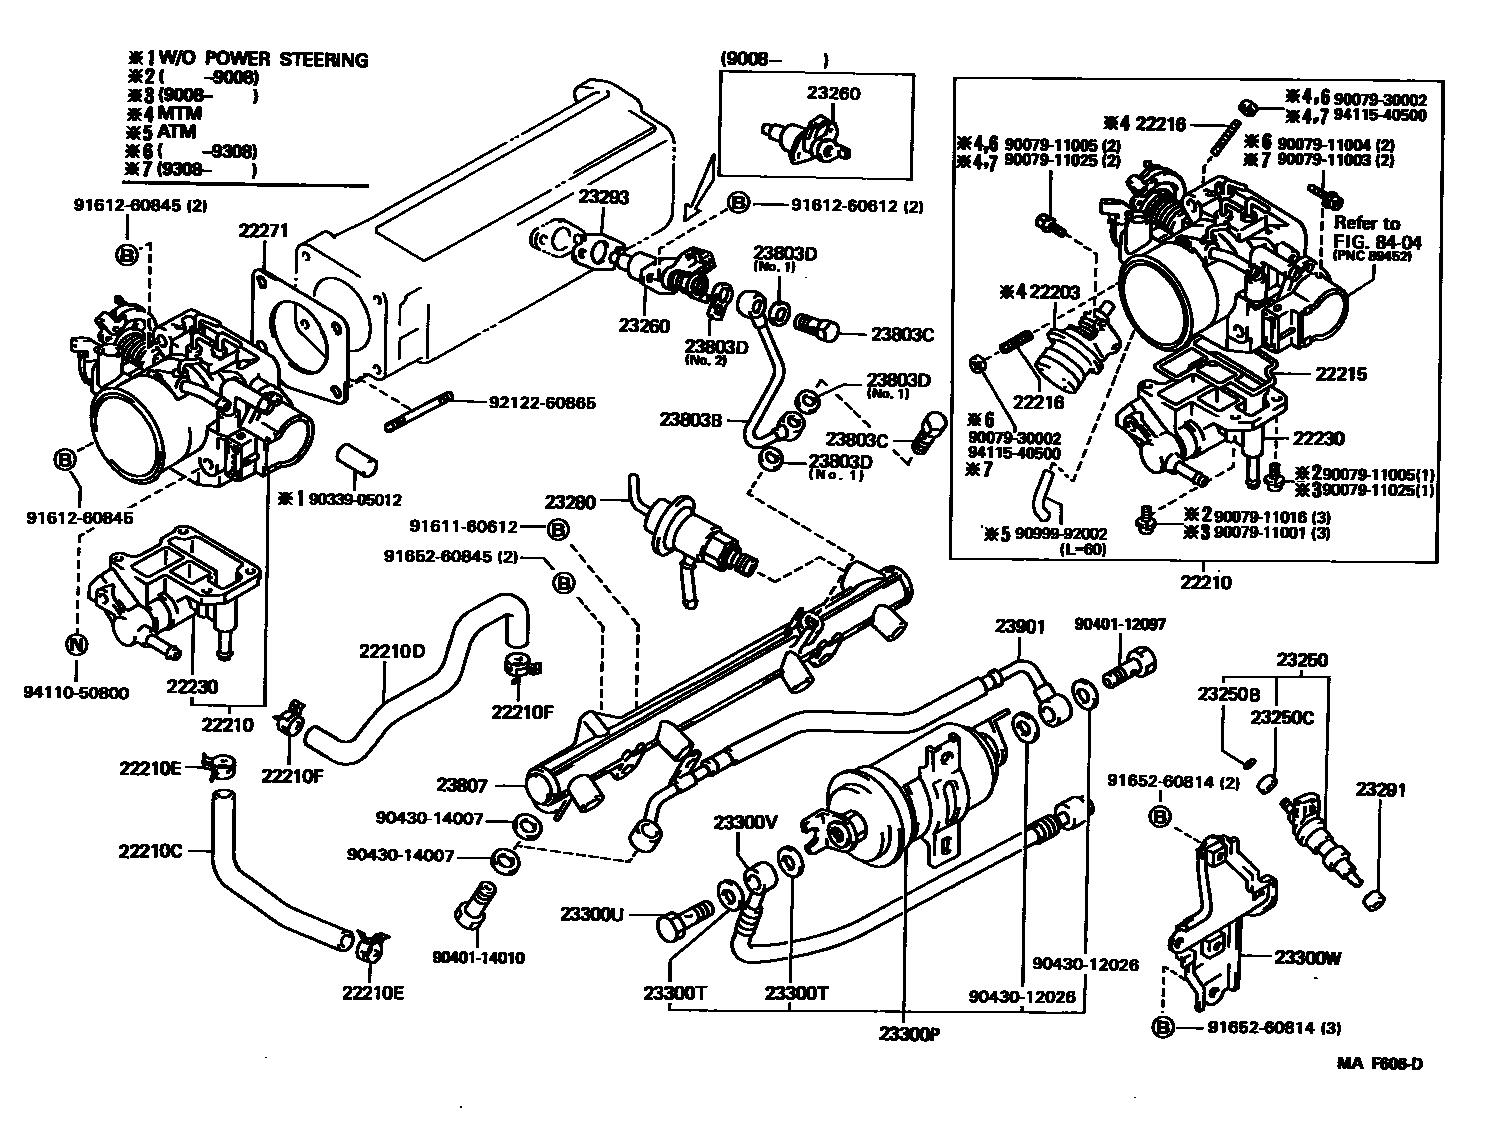 Surprising Toyota 22R Engine Coolant Diagram Basic Electronics Wiring Diagram Wiring Cloud Onicaalyptbenolwigegmohammedshrineorg